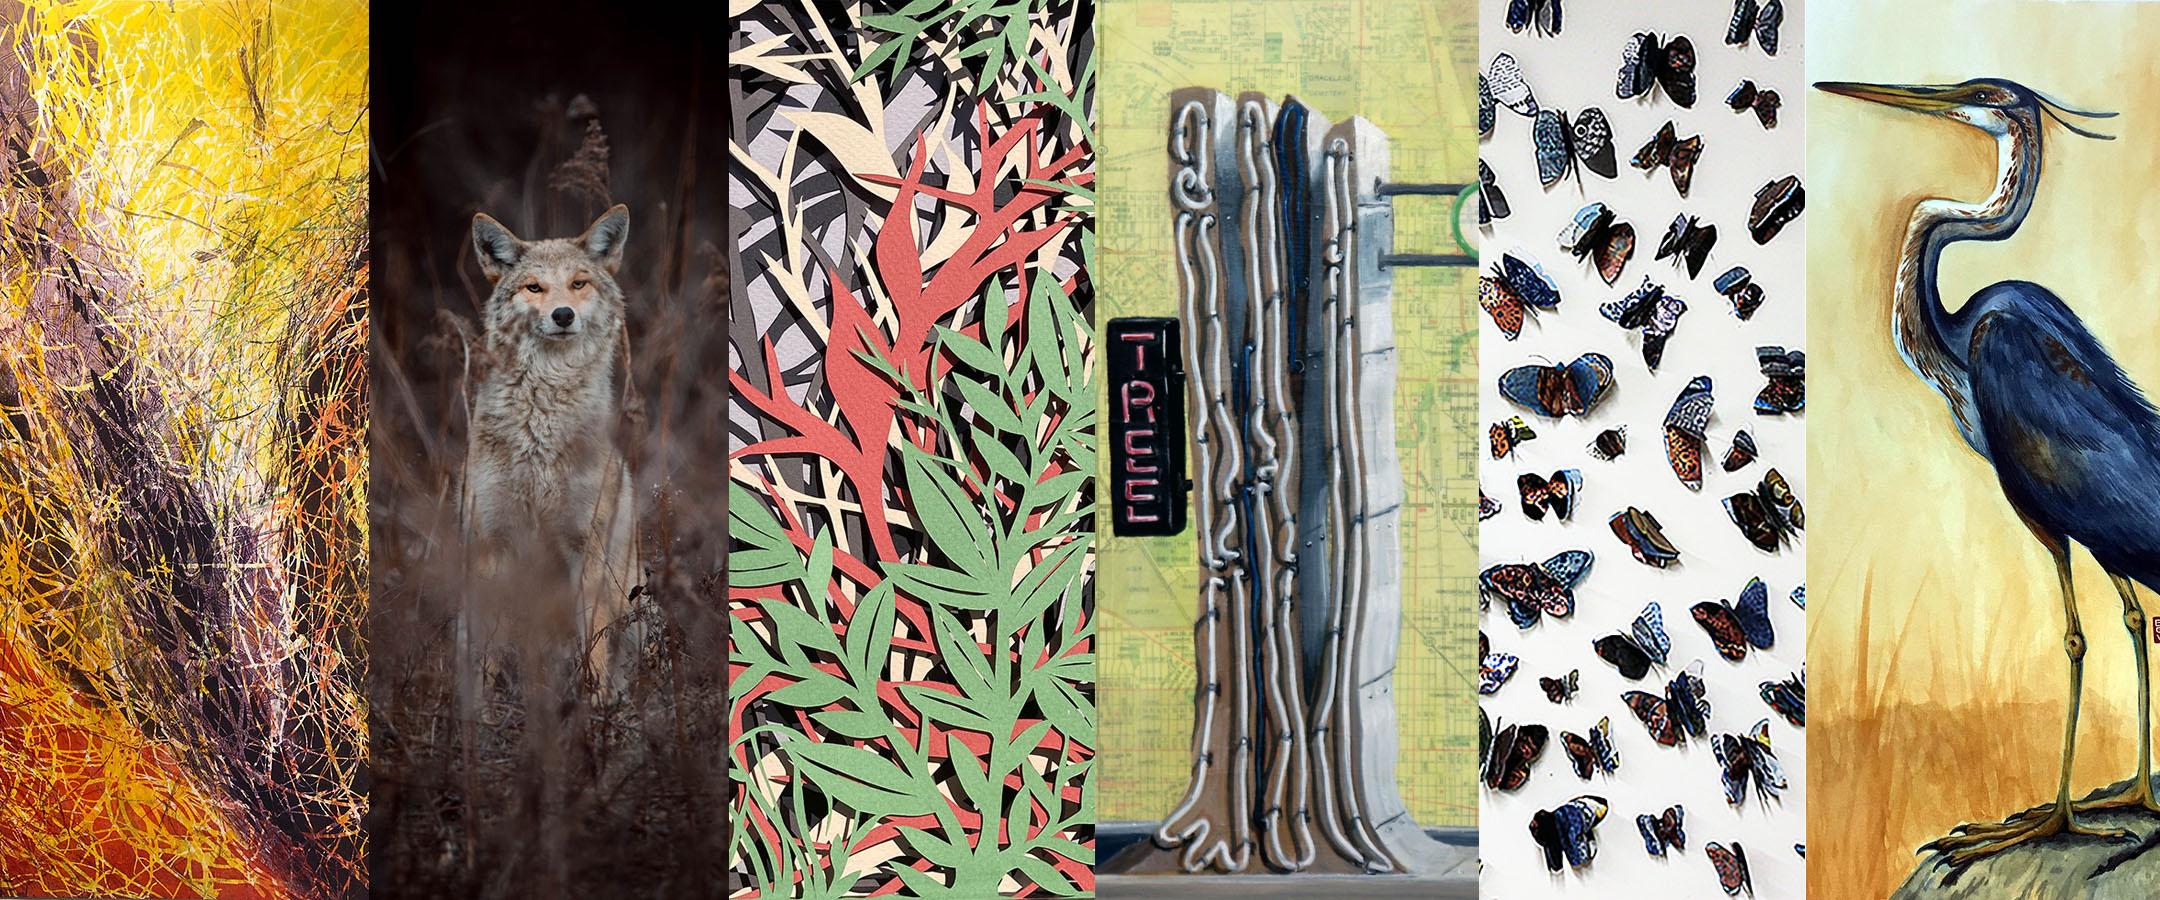 ARTservancy collage